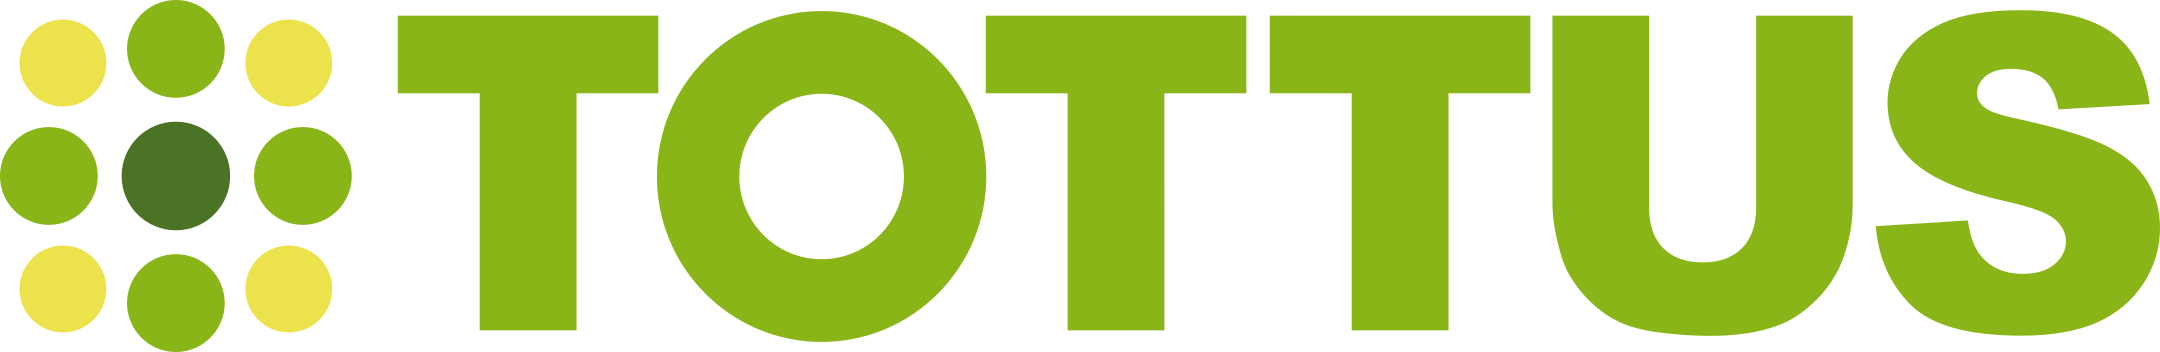 tottus logo 1 - TOTTUS Logo